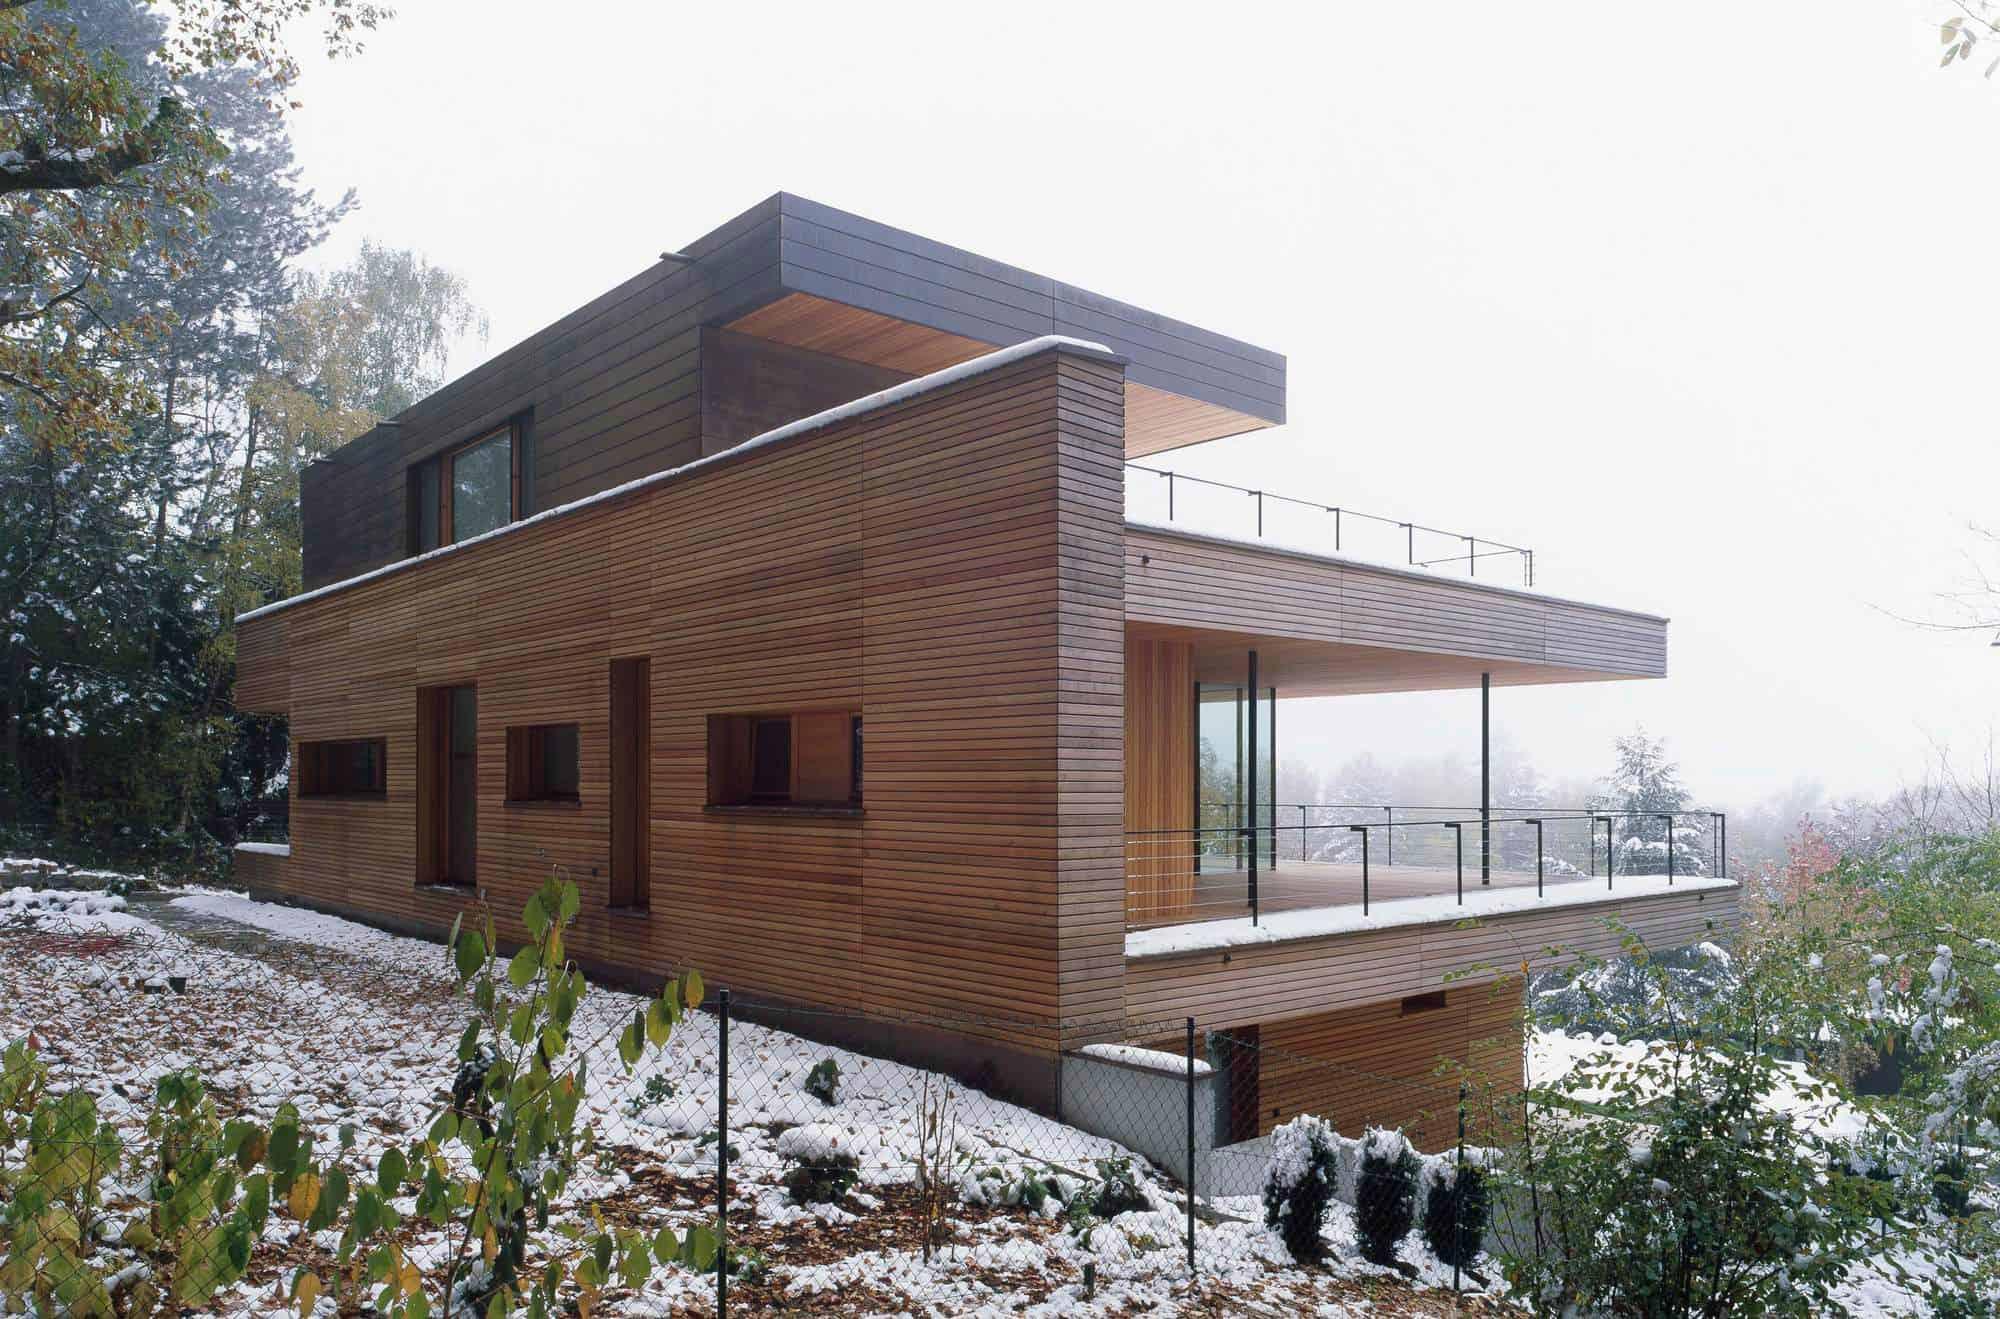 House Heilbronn by k m architektur (2)